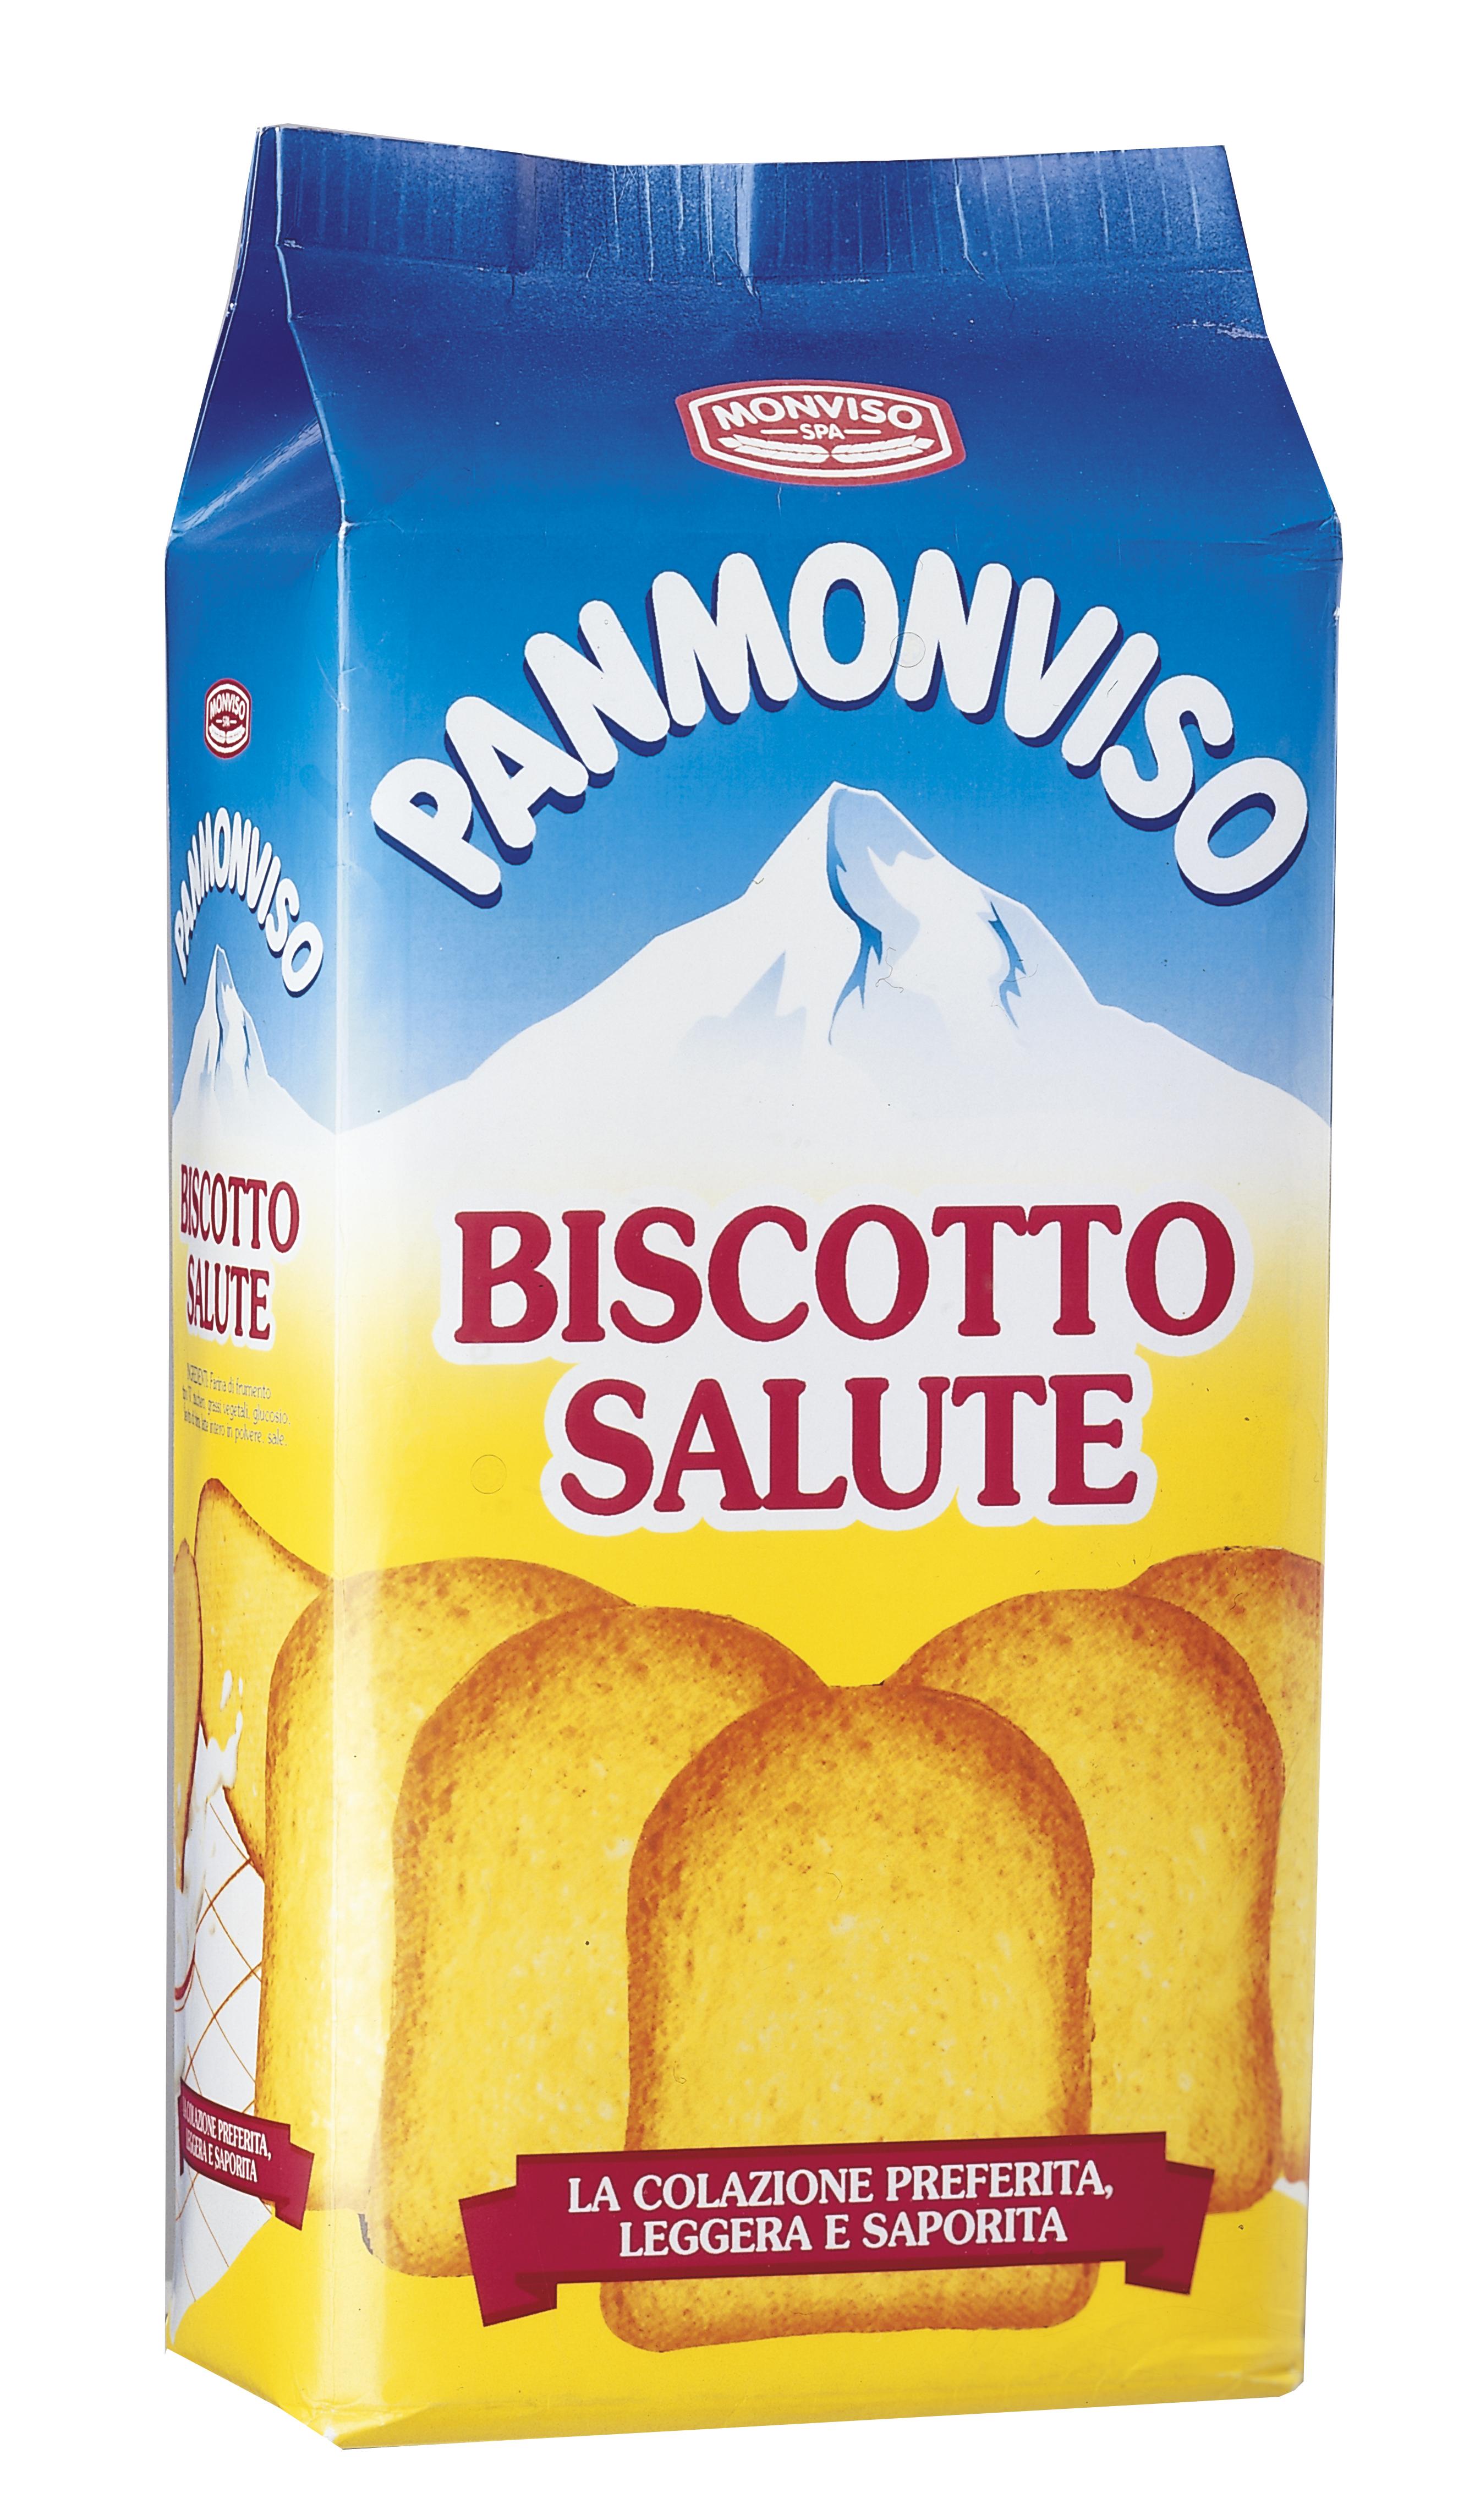 01 Panmonviso